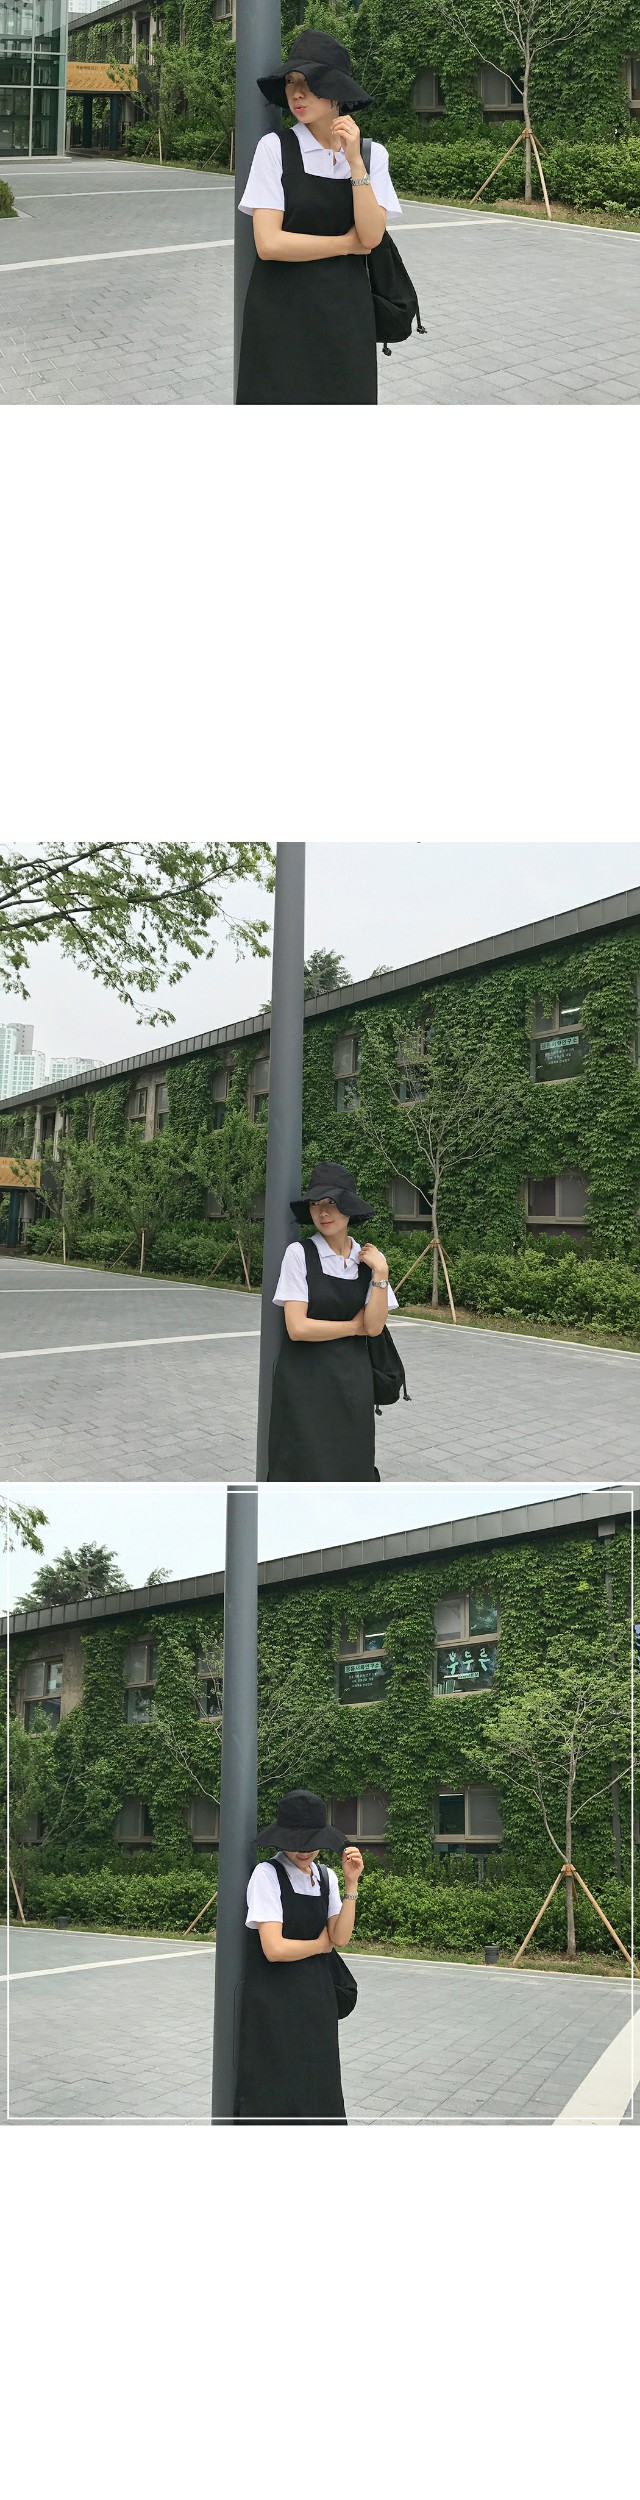 School-One Piece